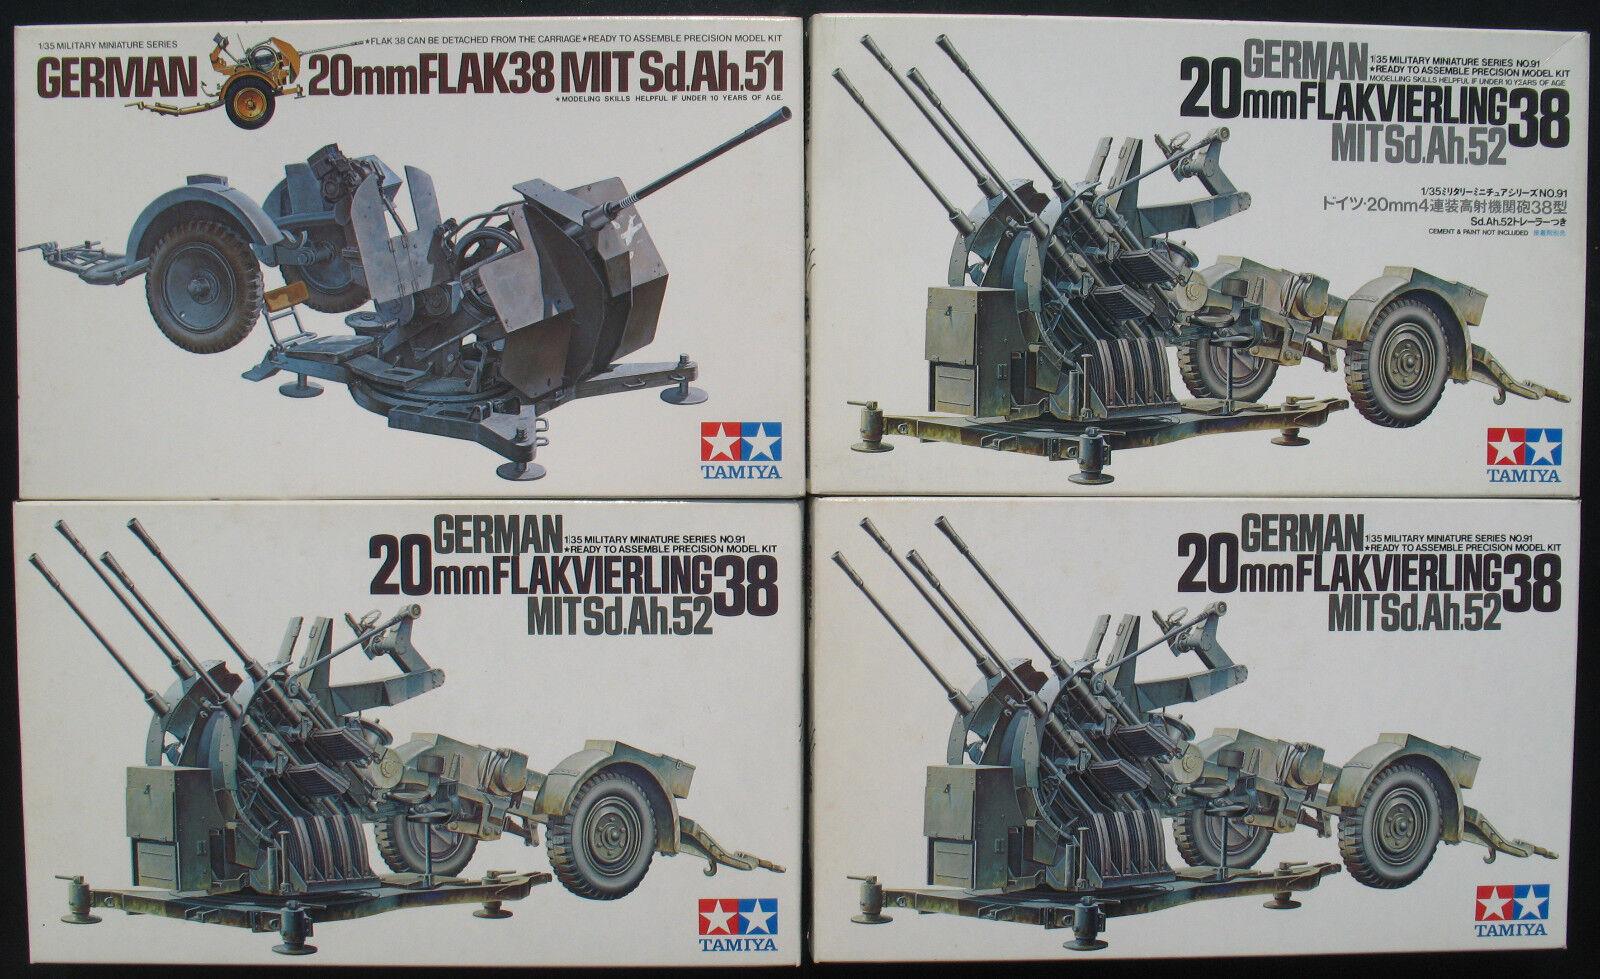 4x TAMIYA MM191 + 202 - German 20mm  FLAK + FLAKVIERLING 38 - 1 35 Modelllbausatz